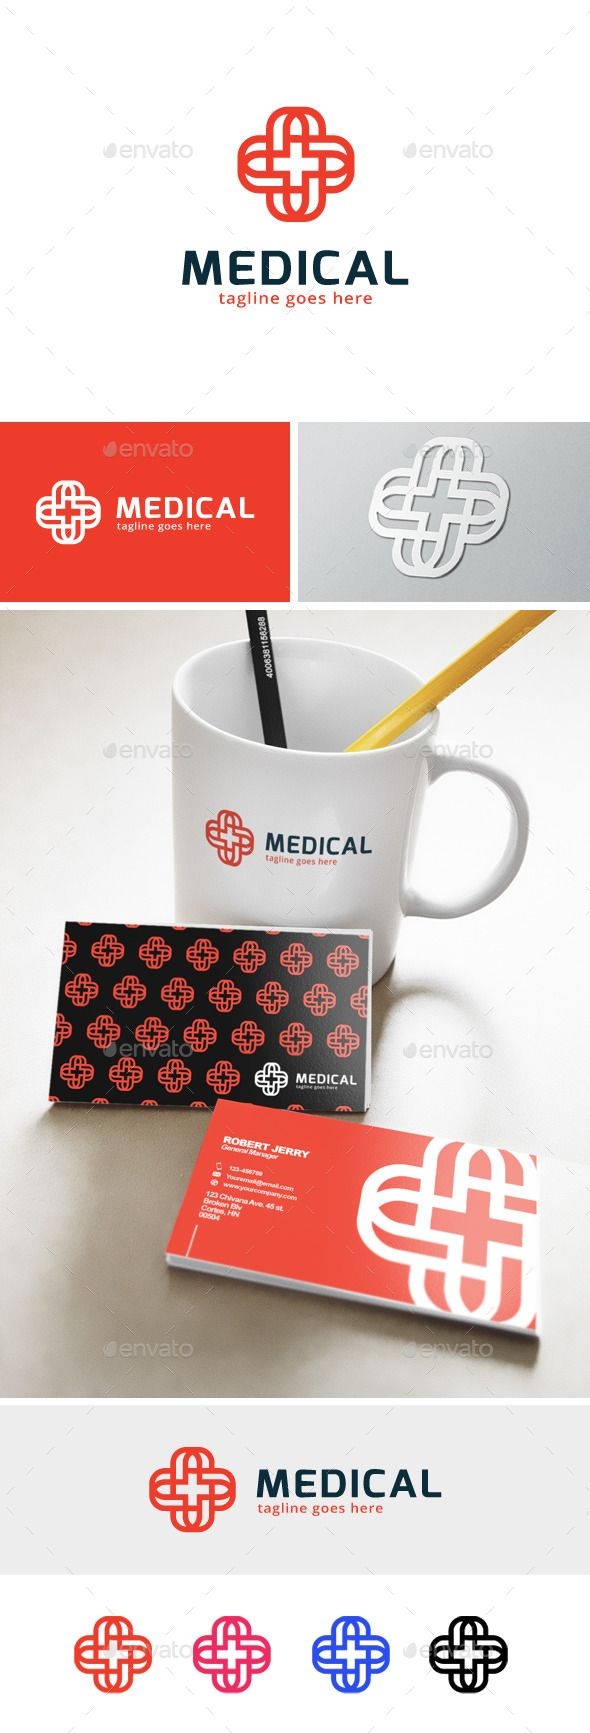 Medical Plus  Logo Design Template Vector #logotype Download it here: http://graphicriver.net/item/medical-plus-logo/12043162?s_rank=636?ref=nexion